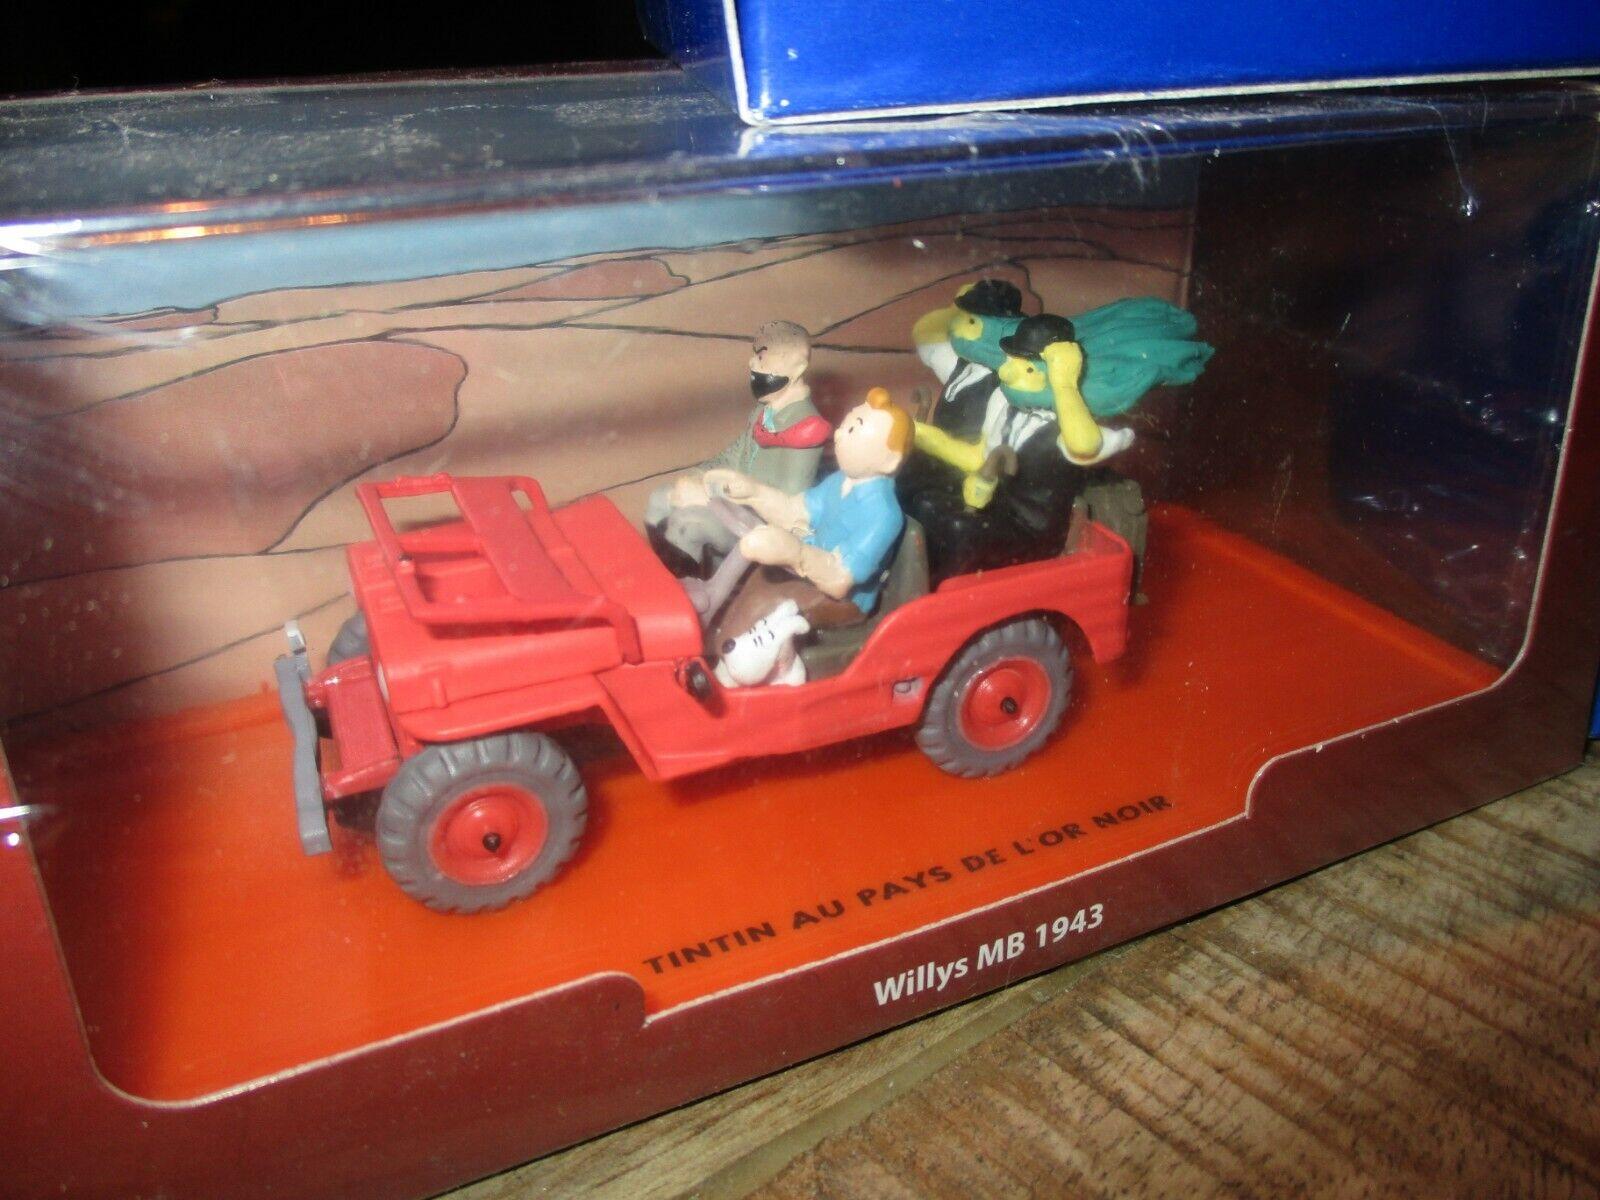 Tintin-Lot Tintin-Lot Tintin-Lot Taxi New-Delhi&Jeep&Camion Lotus blue Tintin-Neuf-Moulinsart 507f62